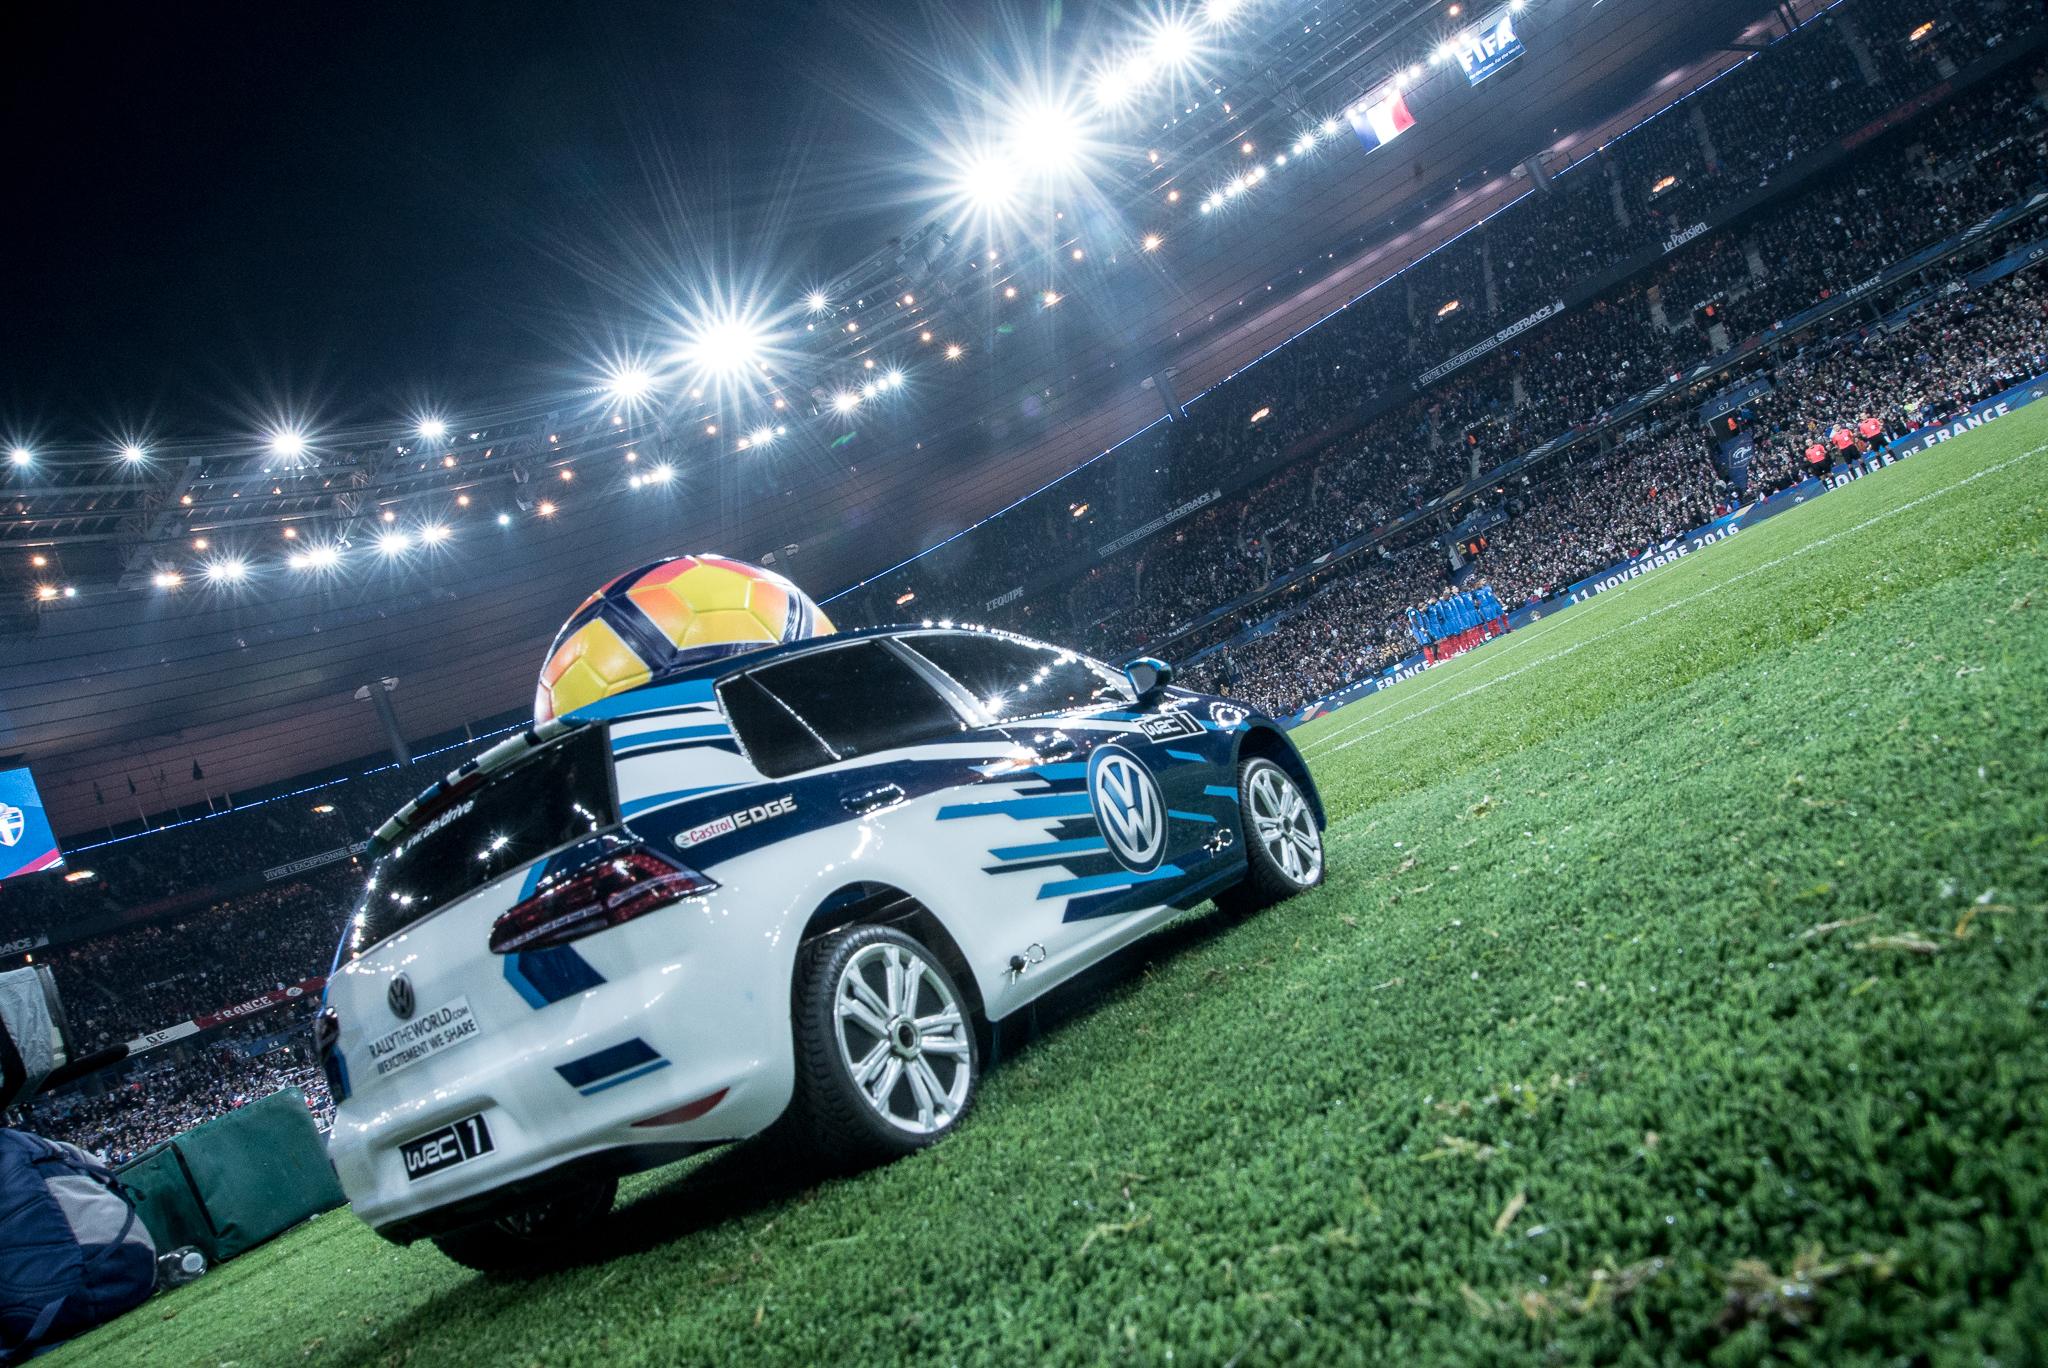 volkswagen-voiture-telecommandee-france-suede-ballon-du-match-foot